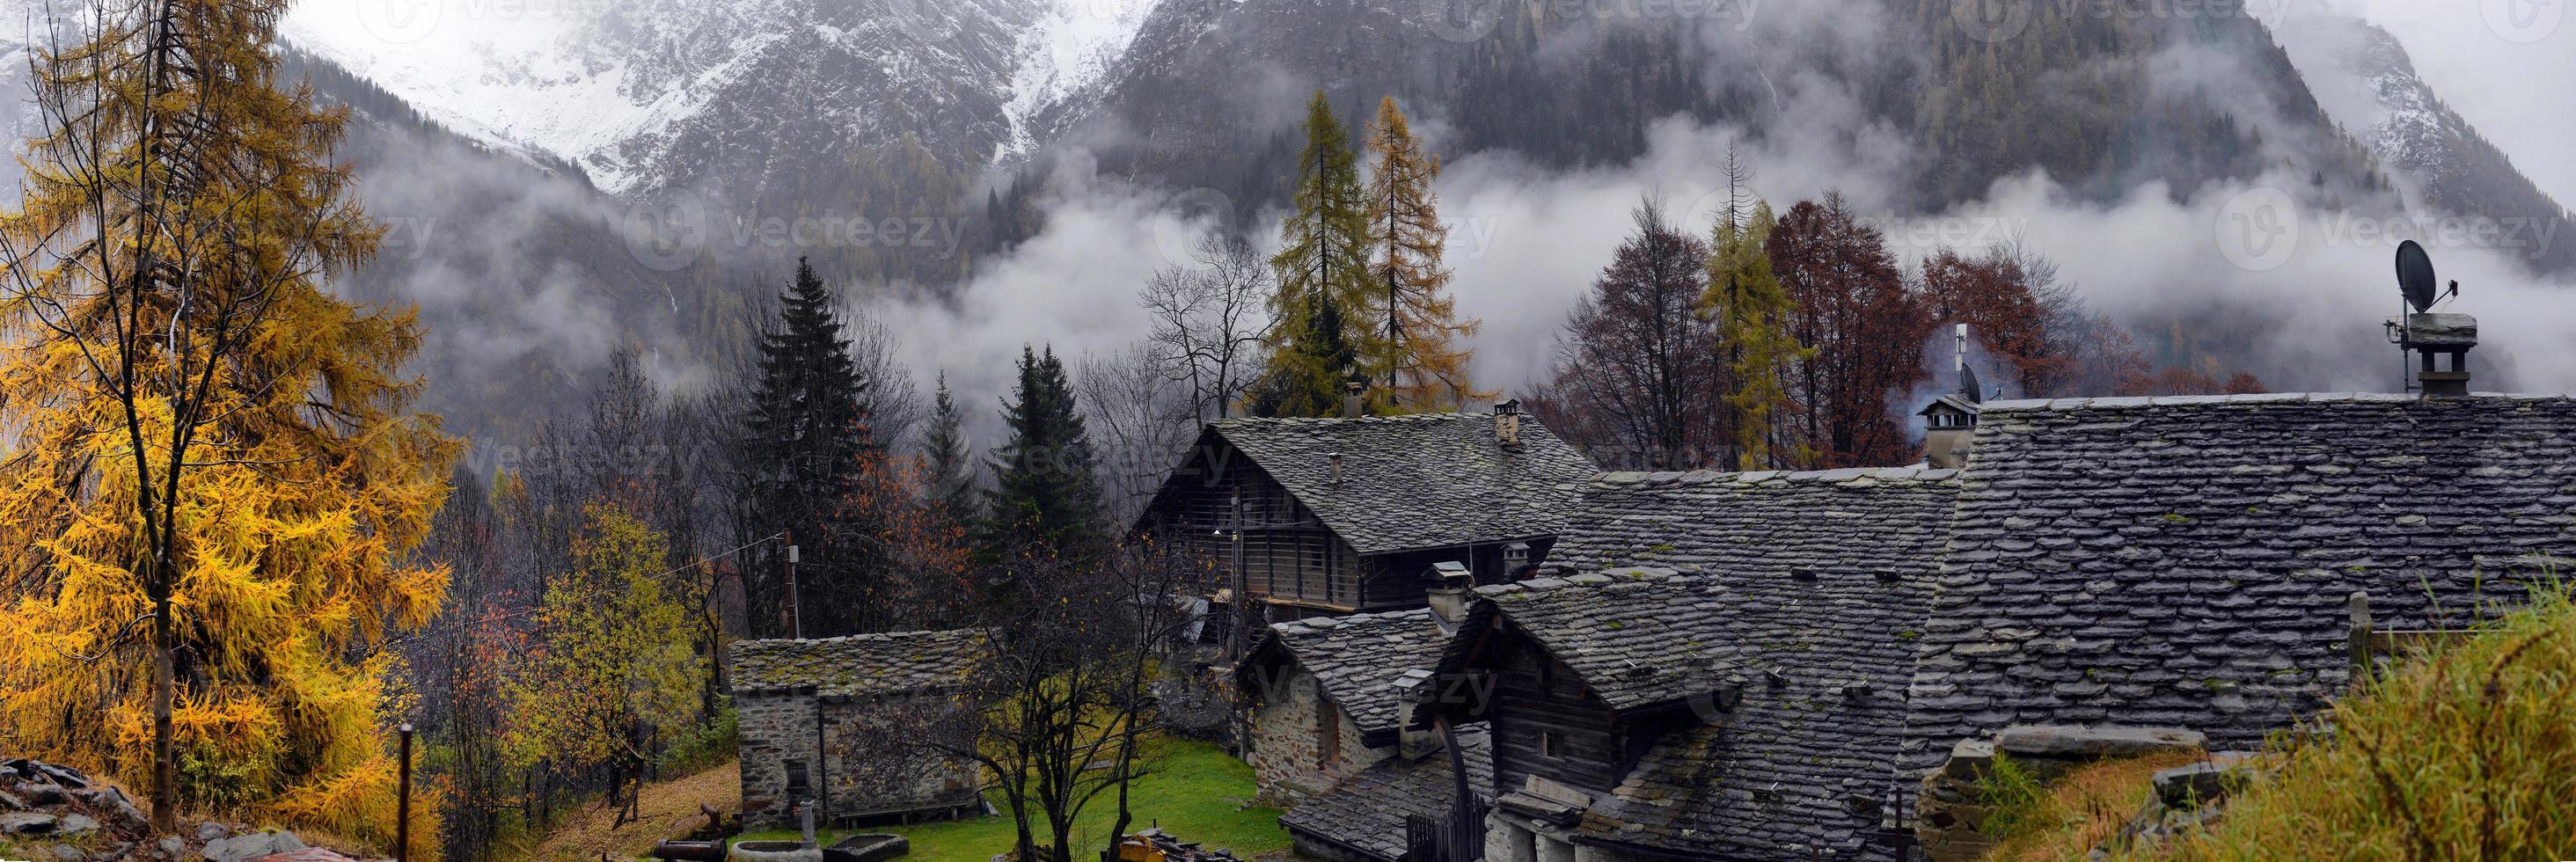 Alpenpanorama vanuit het kleine dorp foto